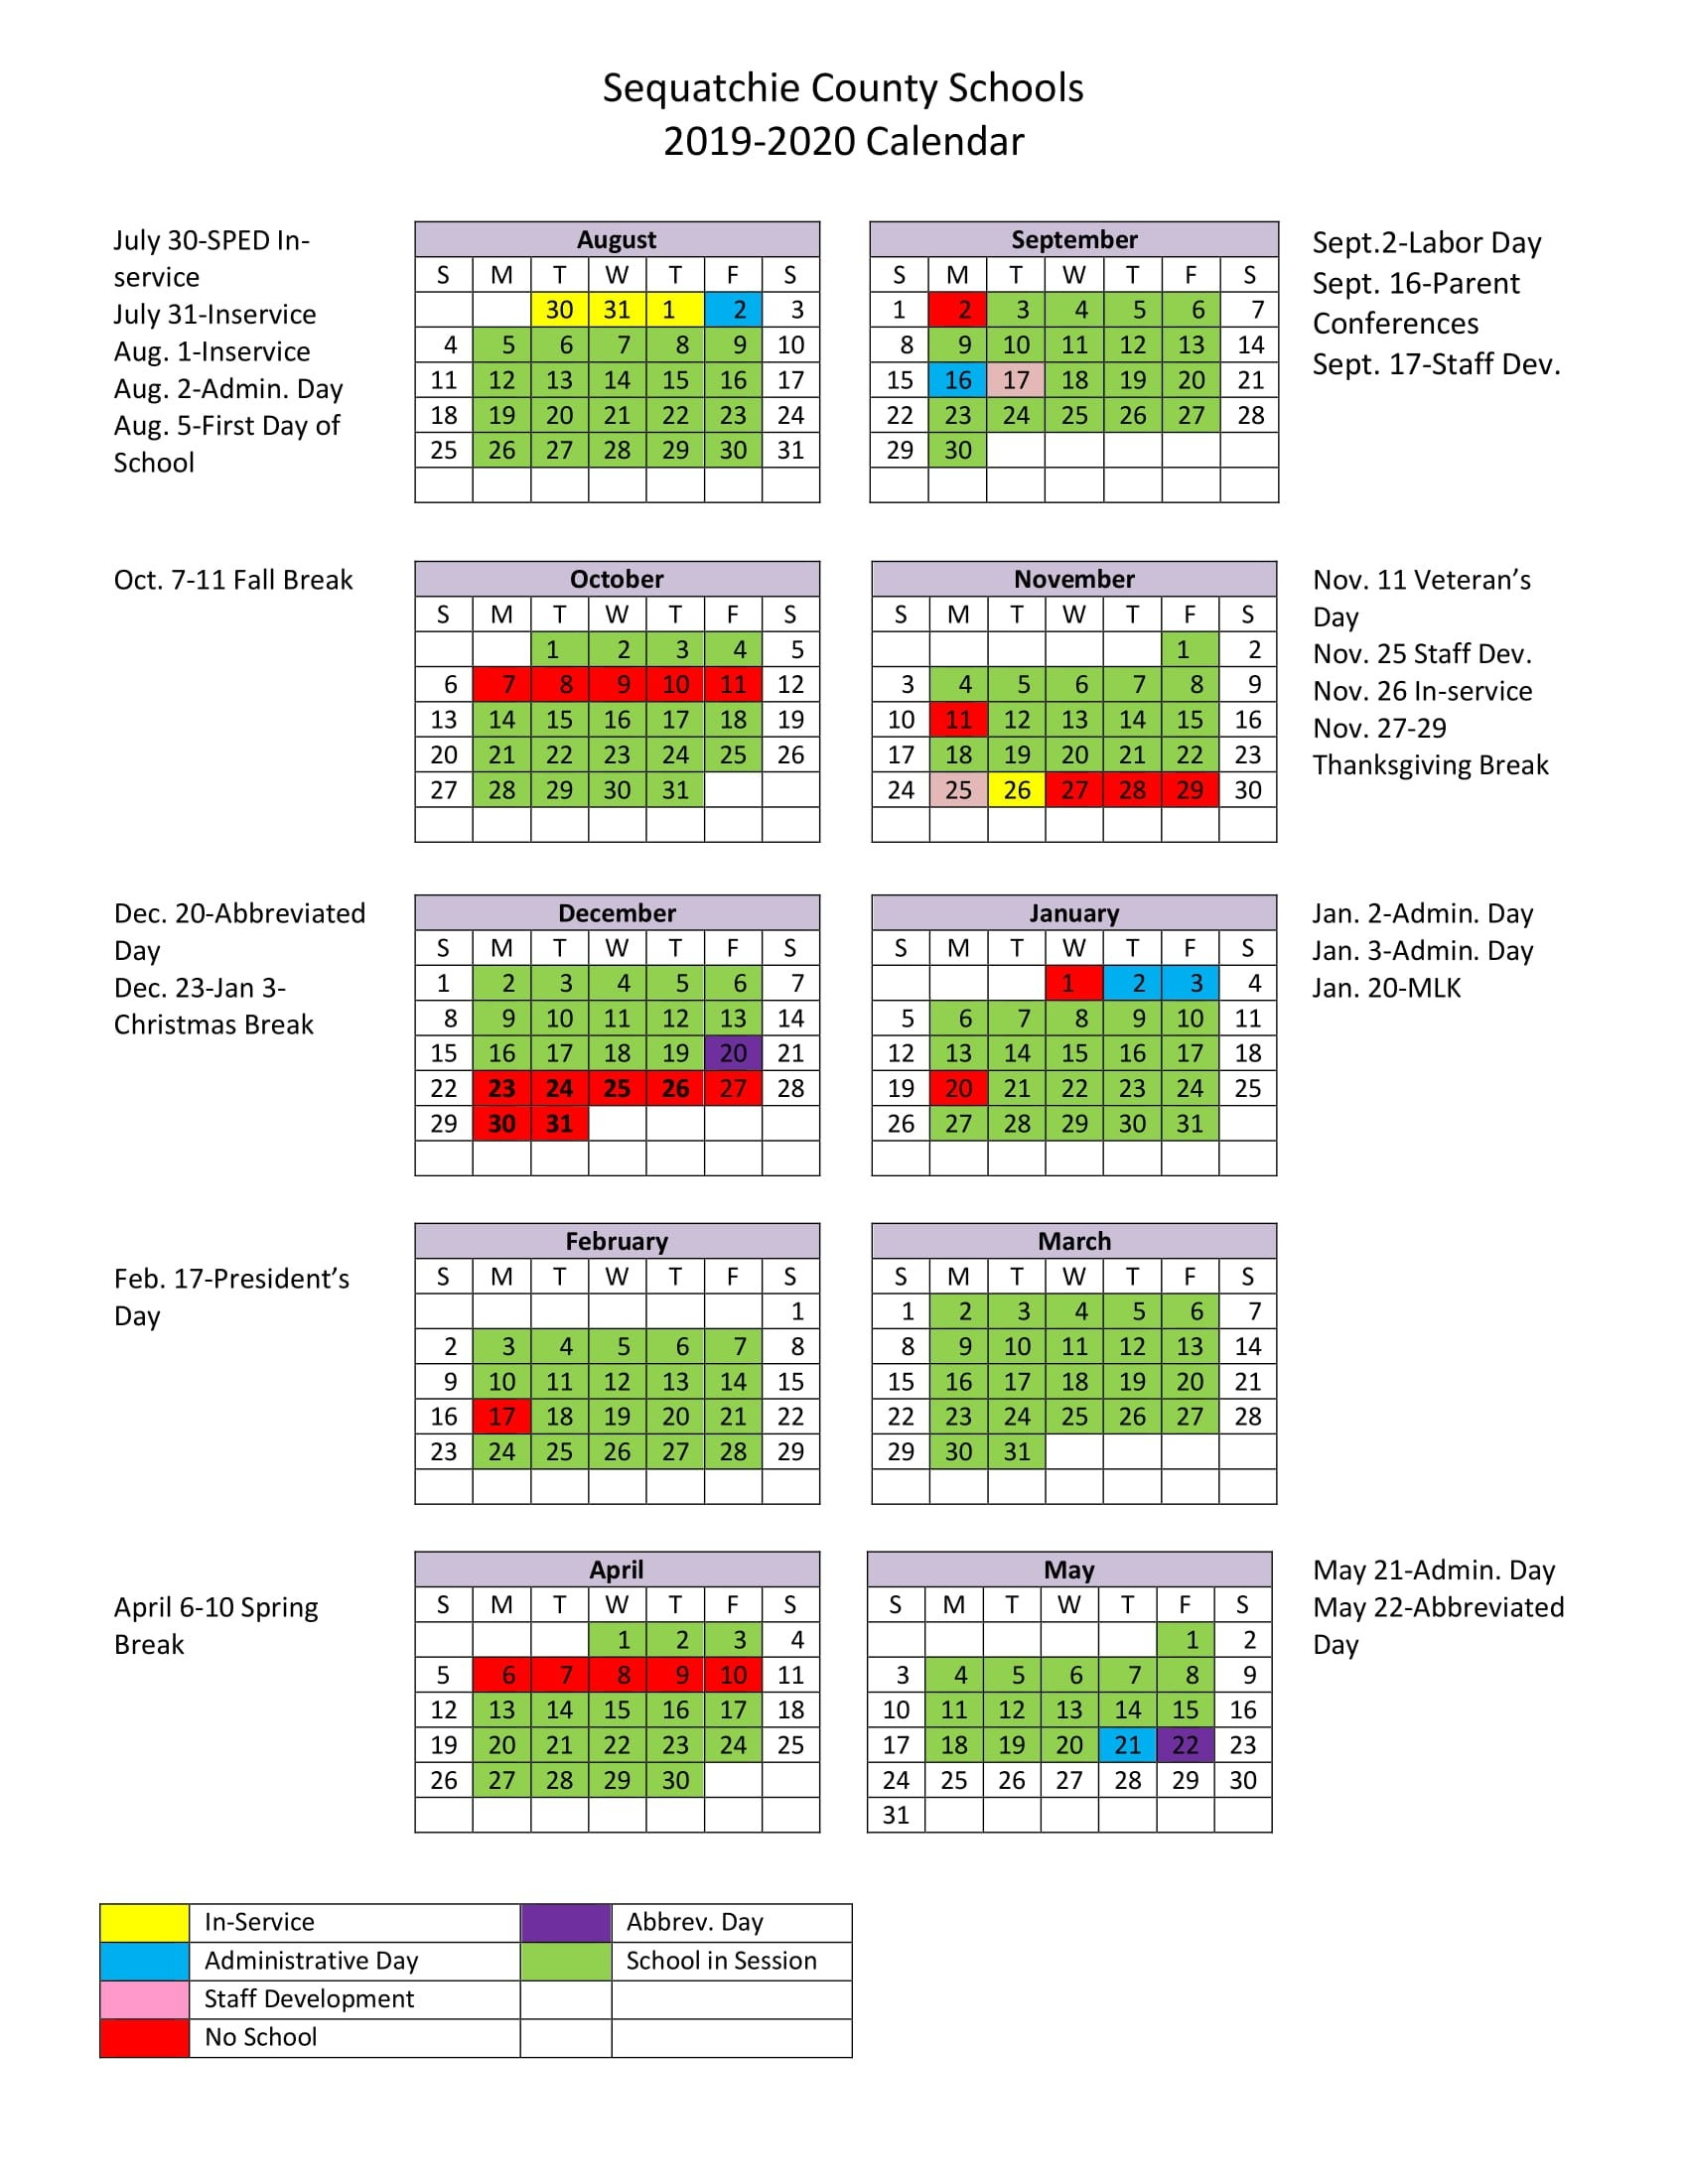 2018-19 School Calendar School Calendar 2019-20